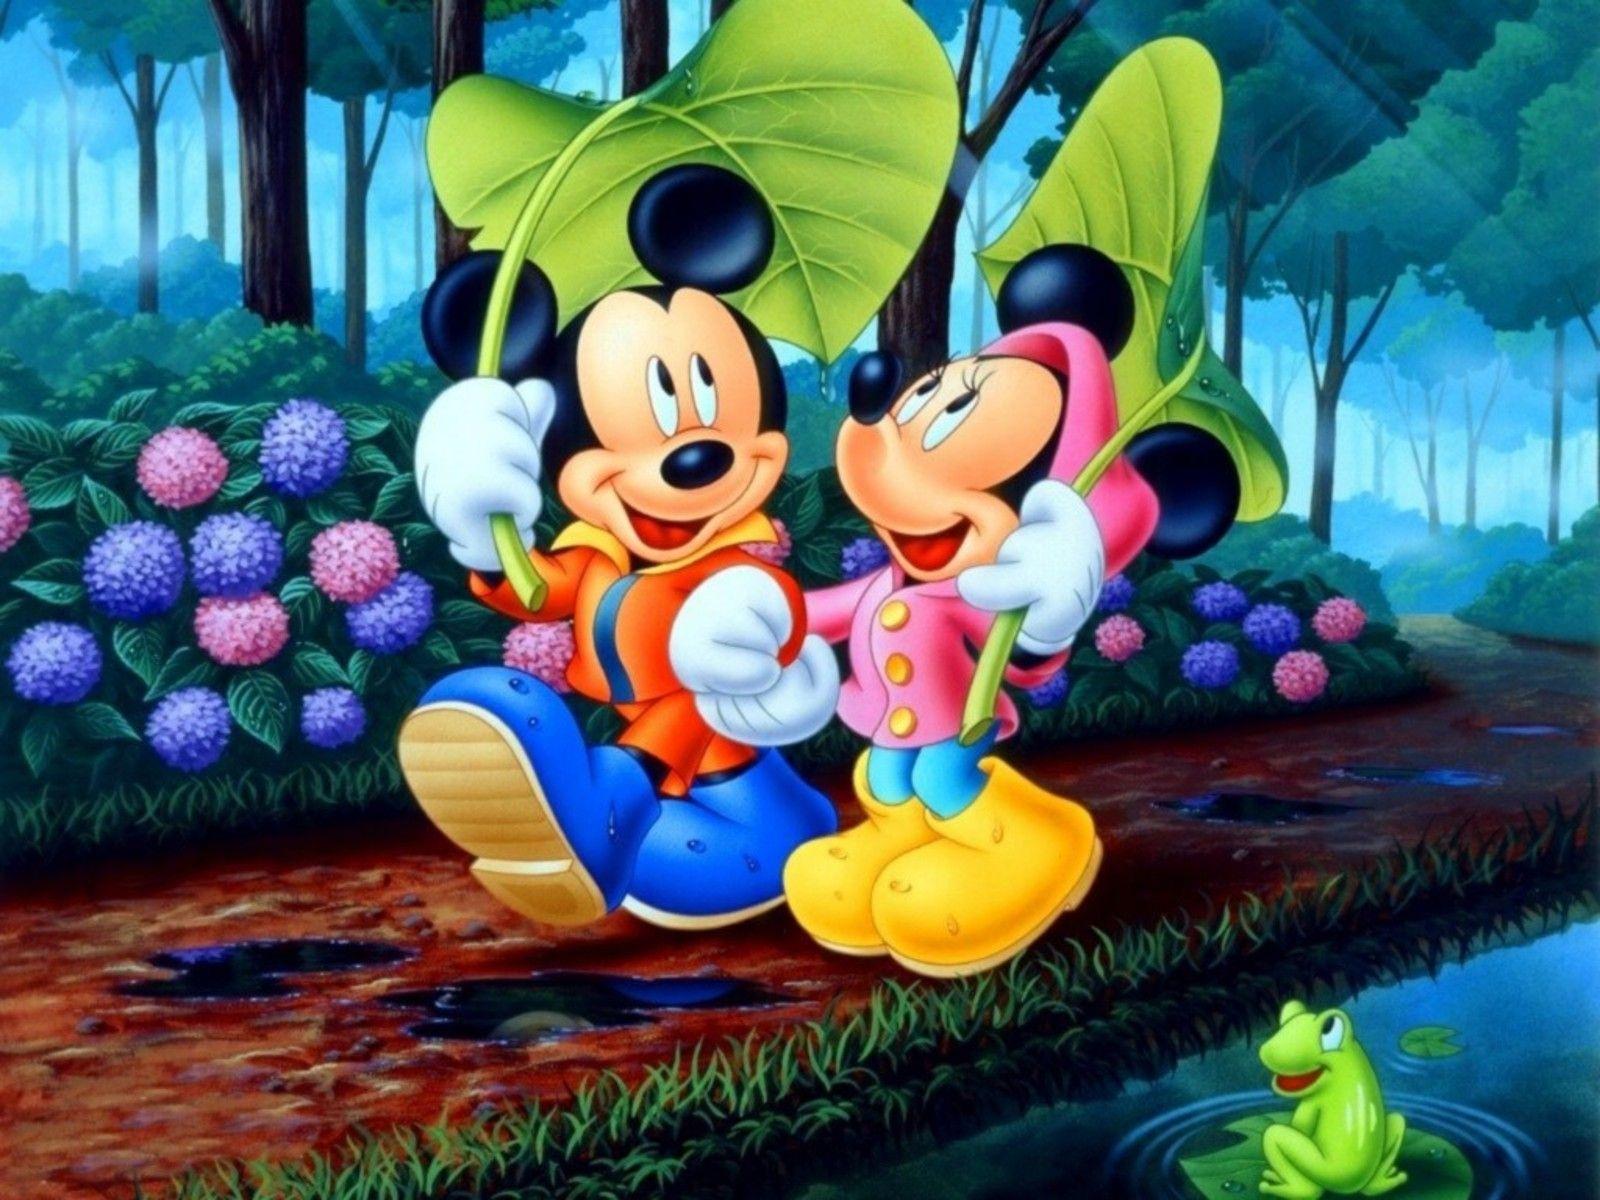 disney cartoon mickey mouse wallpaper hd 5 high resolution wallpaper